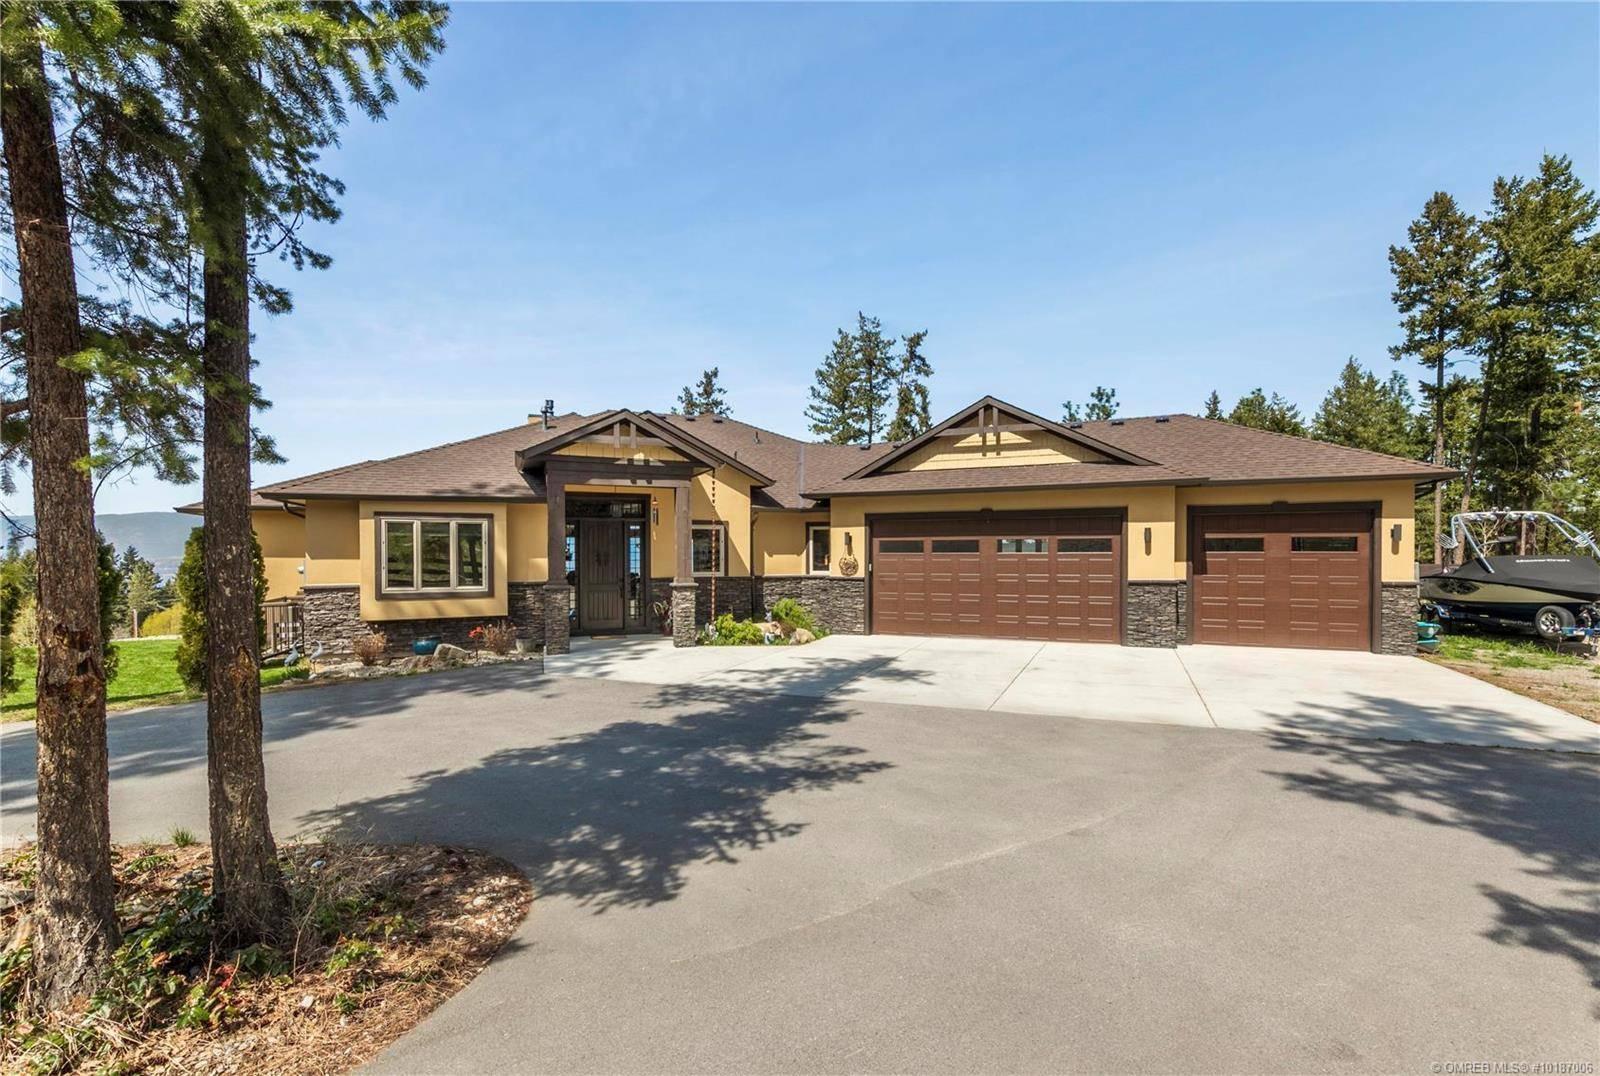 House for sale at 4531 Gaspardone Rd Kelowna British Columbia - MLS: 10187006